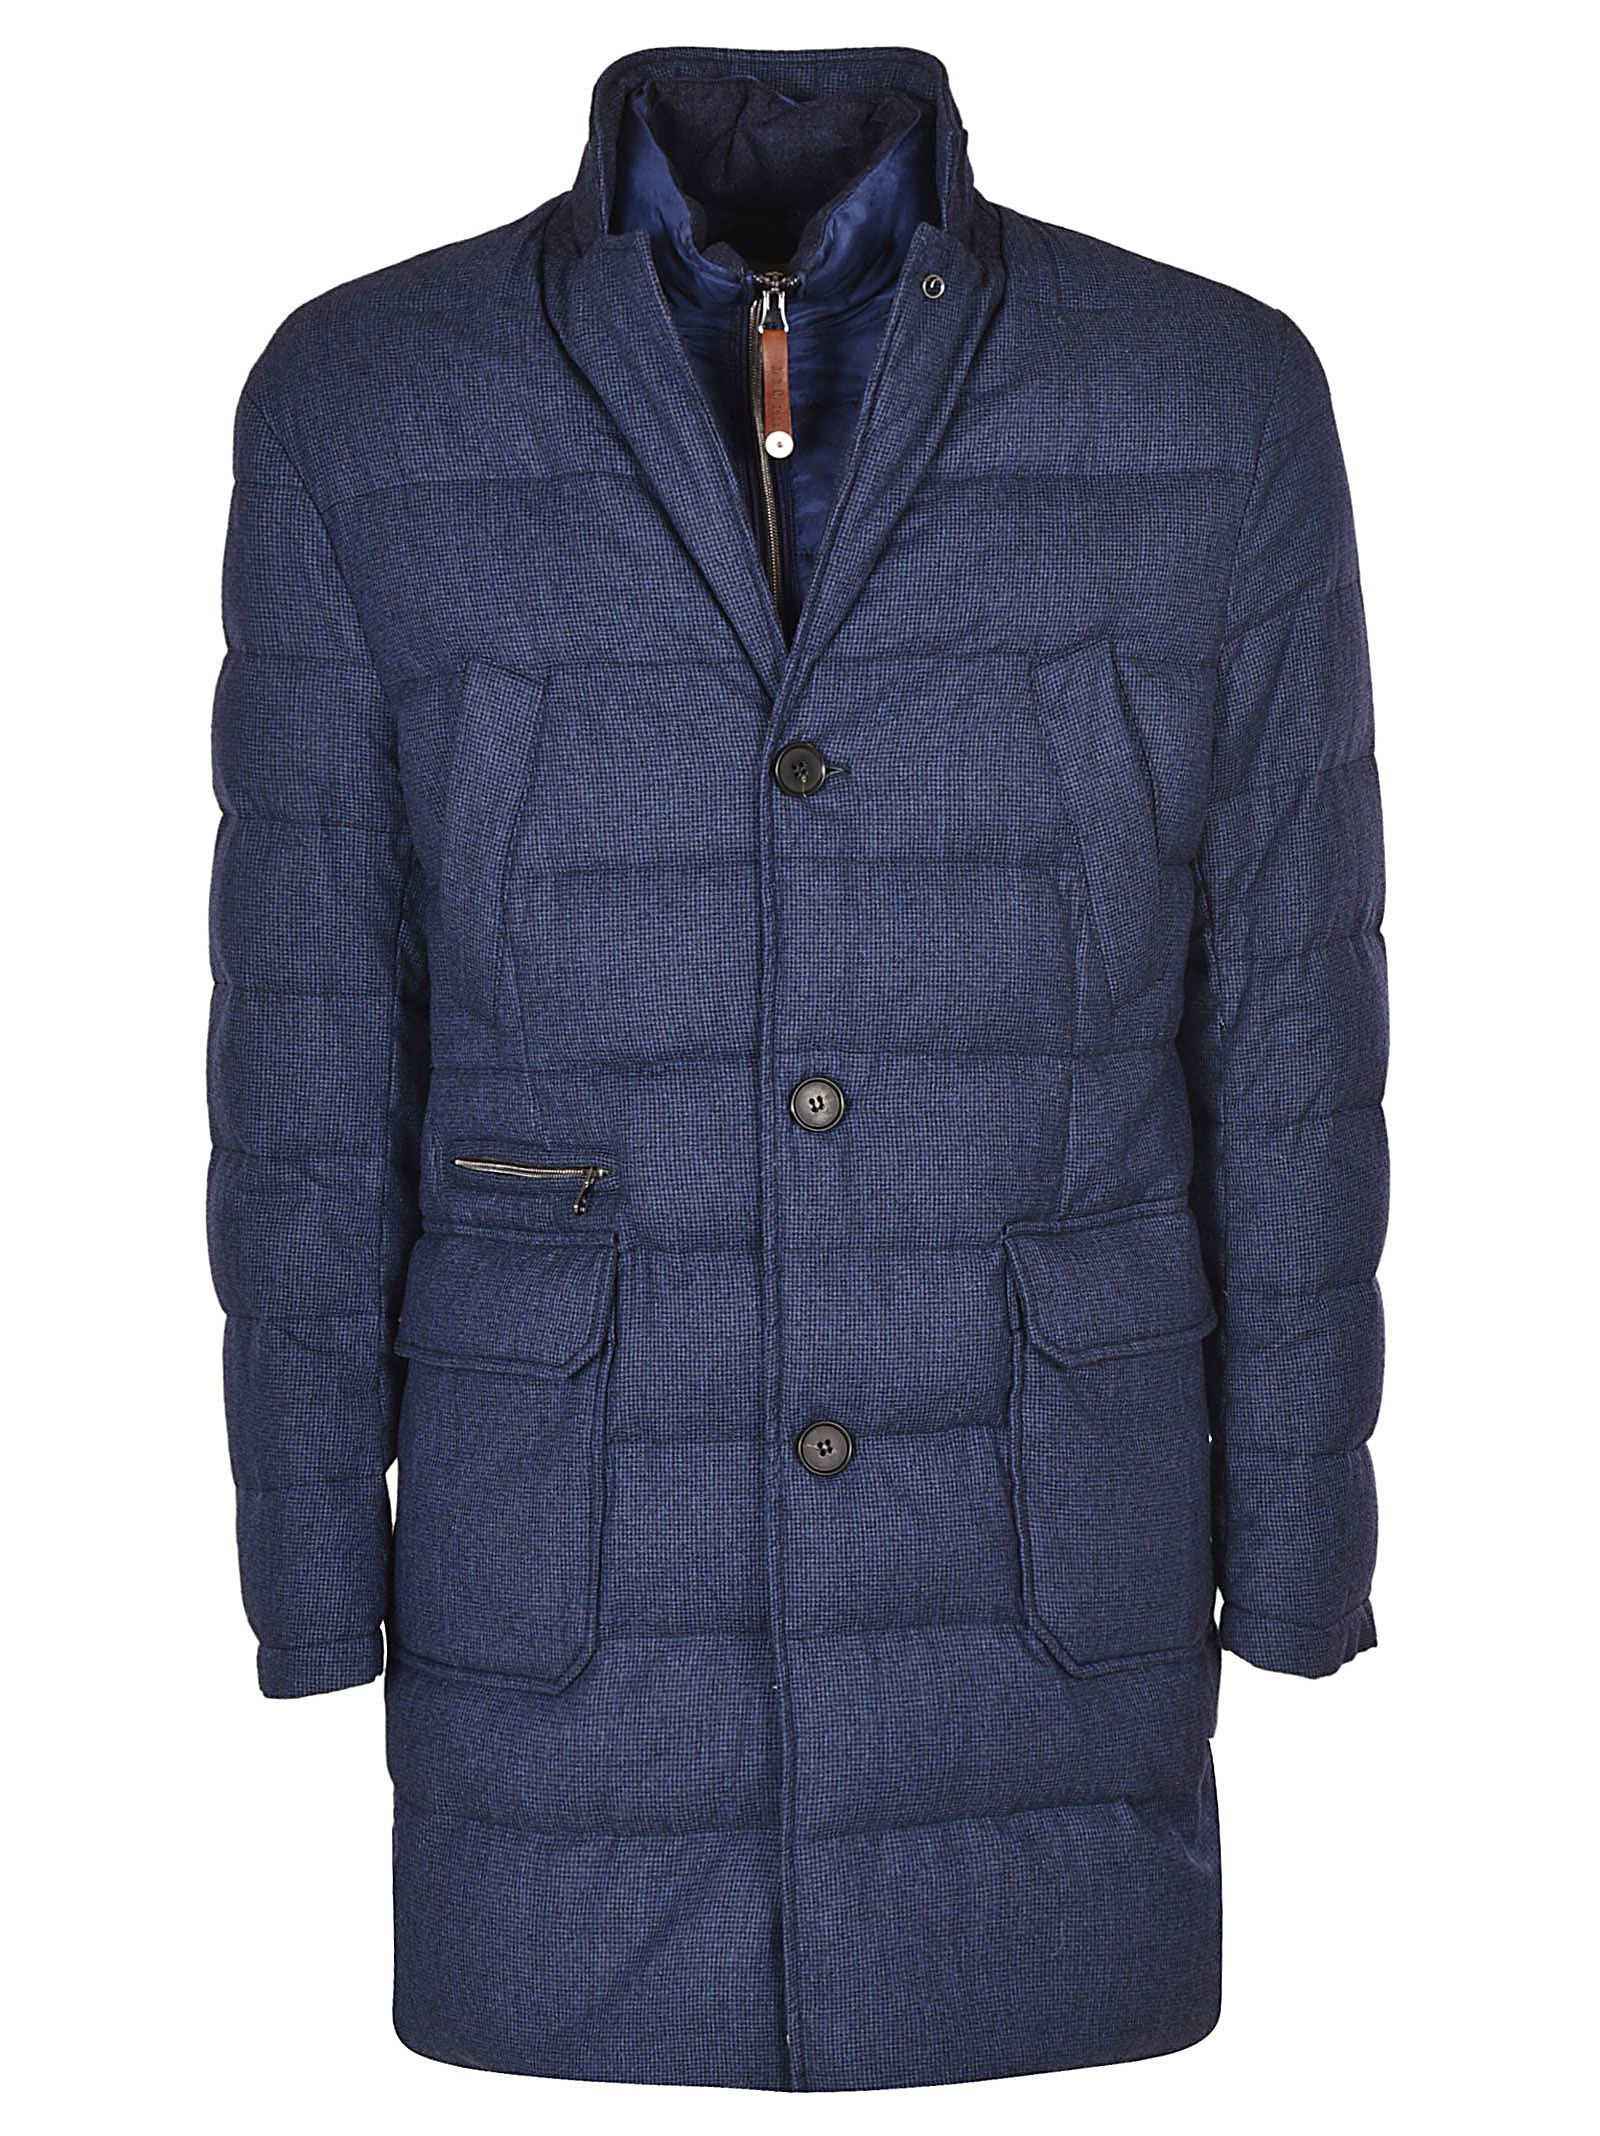 LUIGI BIANCHI MANTOVA Single Breasted Coat in U